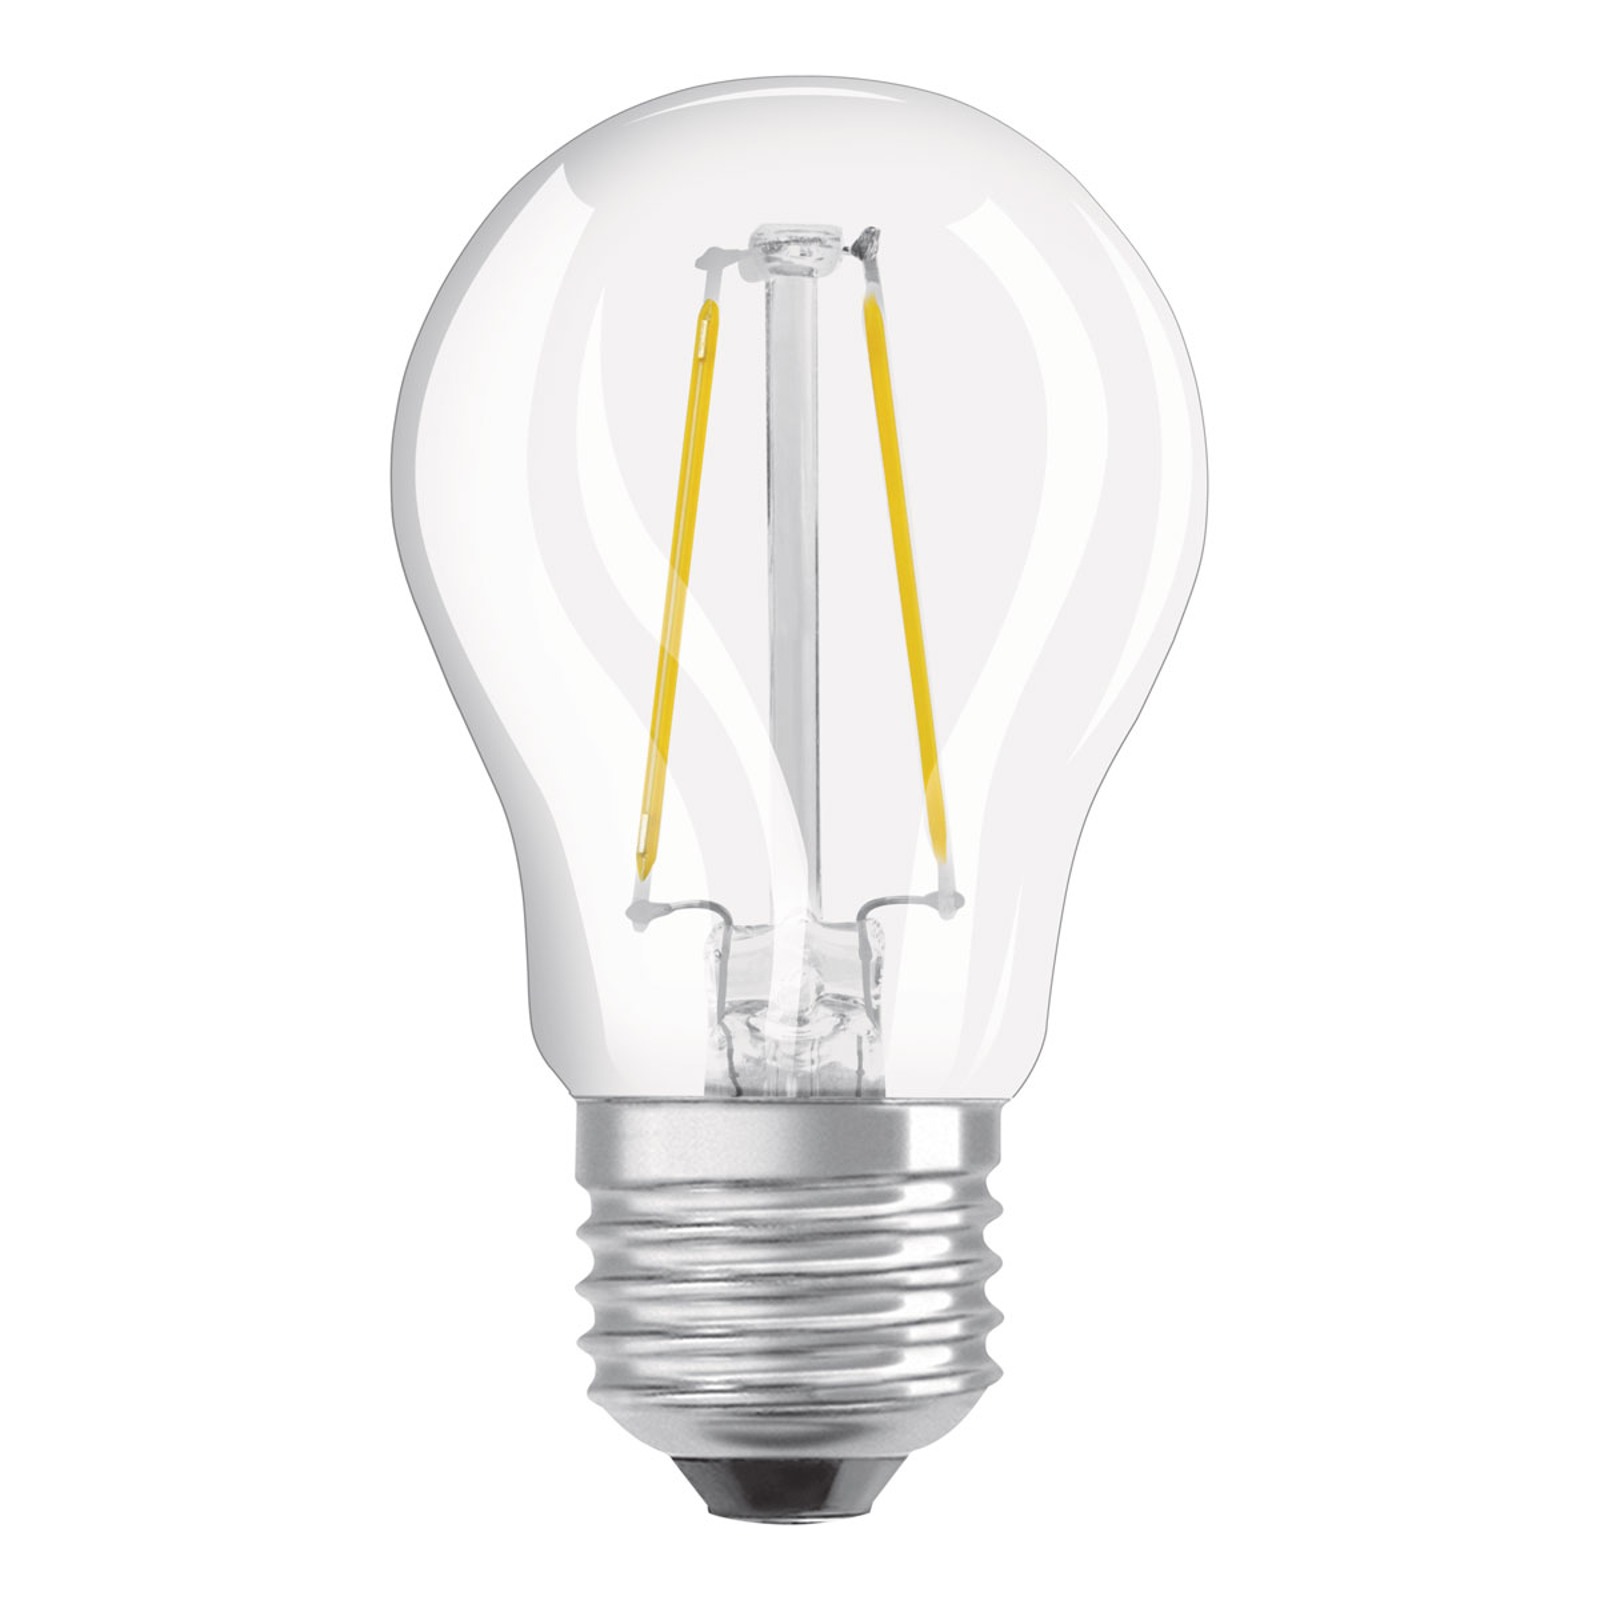 OSRAM-LED-lamppu E27 2,8W himmennettävä, kirkas